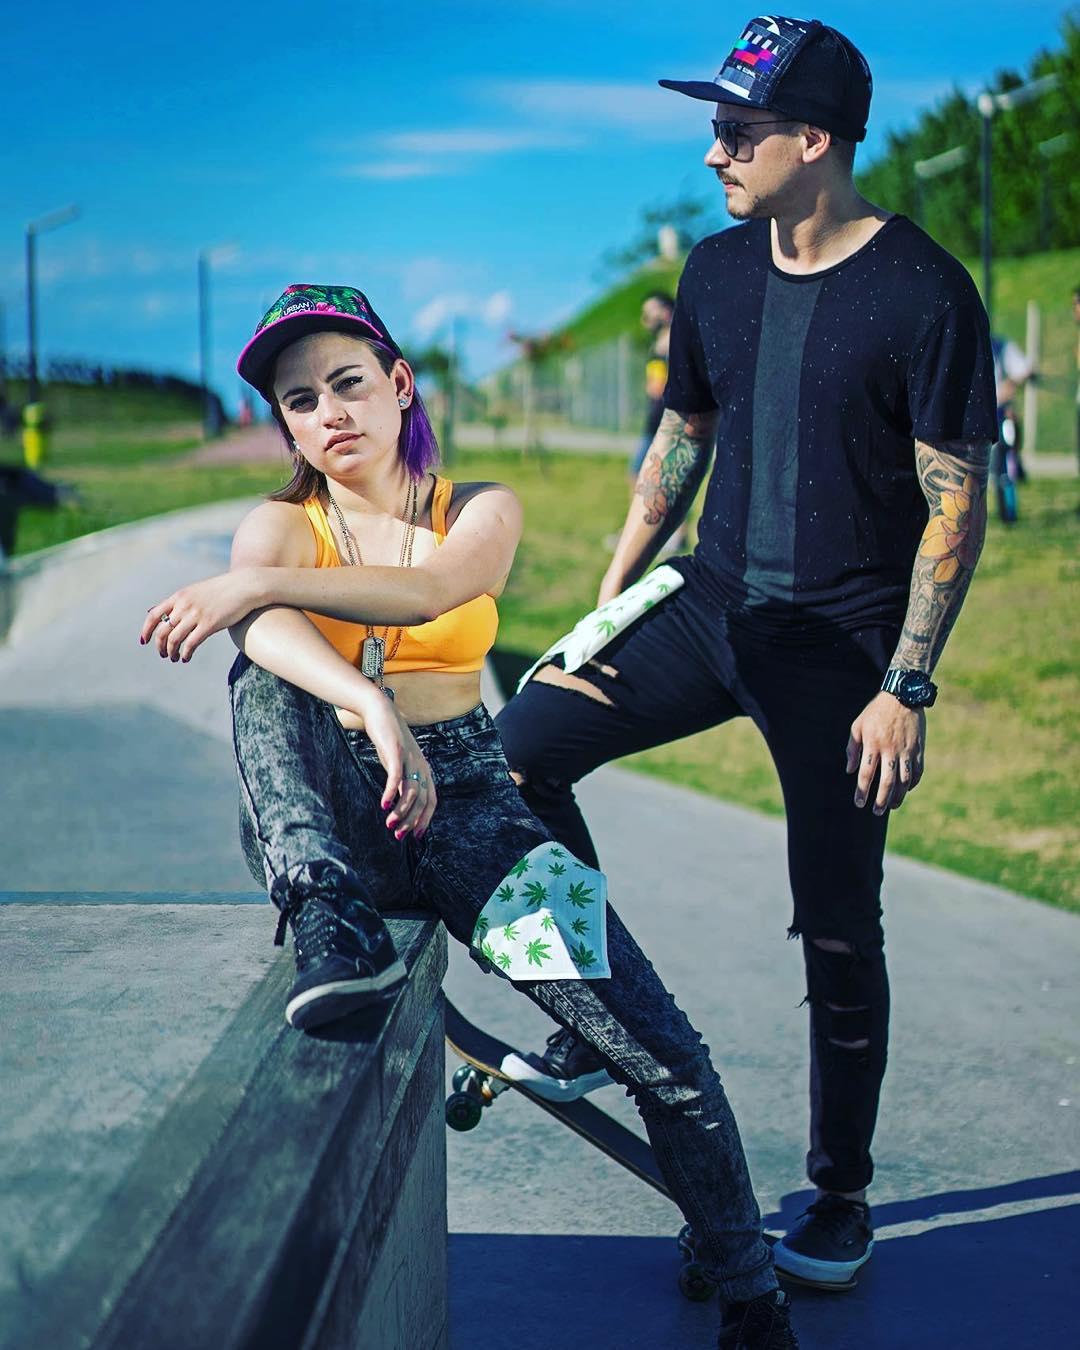 + adelanto de lo q se viene ////// TRUCKER BIT /////// Producción @redbatfoto / #fashion #cool #design #pixel #pixelart #wear #urbanroach #caps #mode #model #style #skate #bandana #trucker